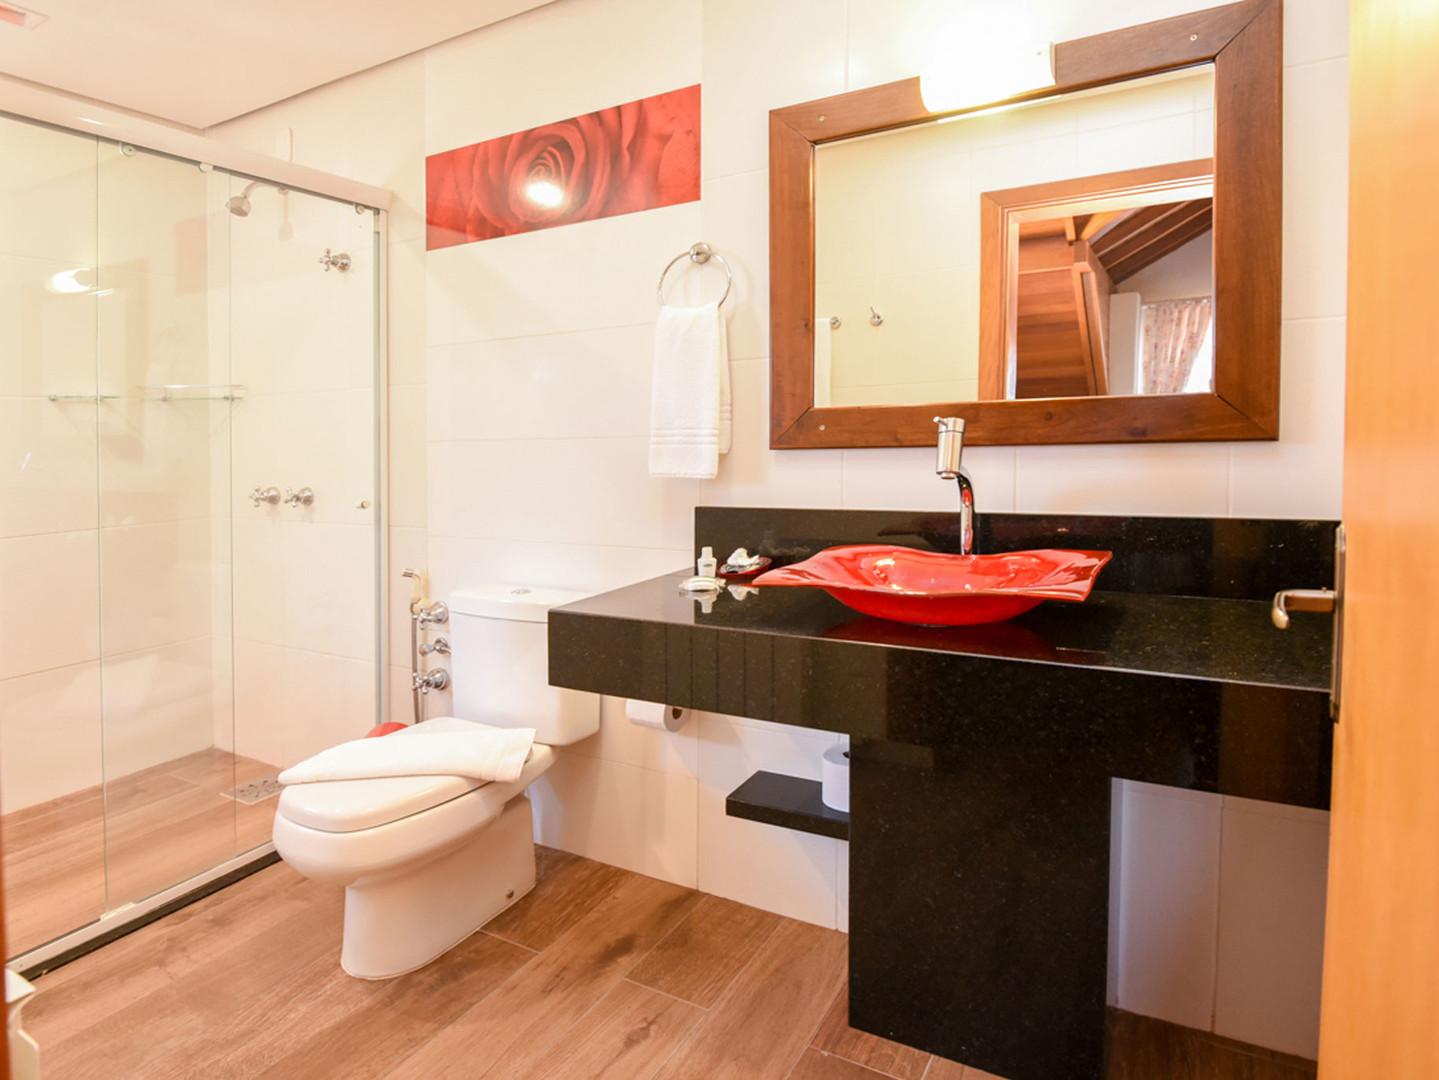 Apto MASTER 24 - Hotel Cabanas Tio Muller